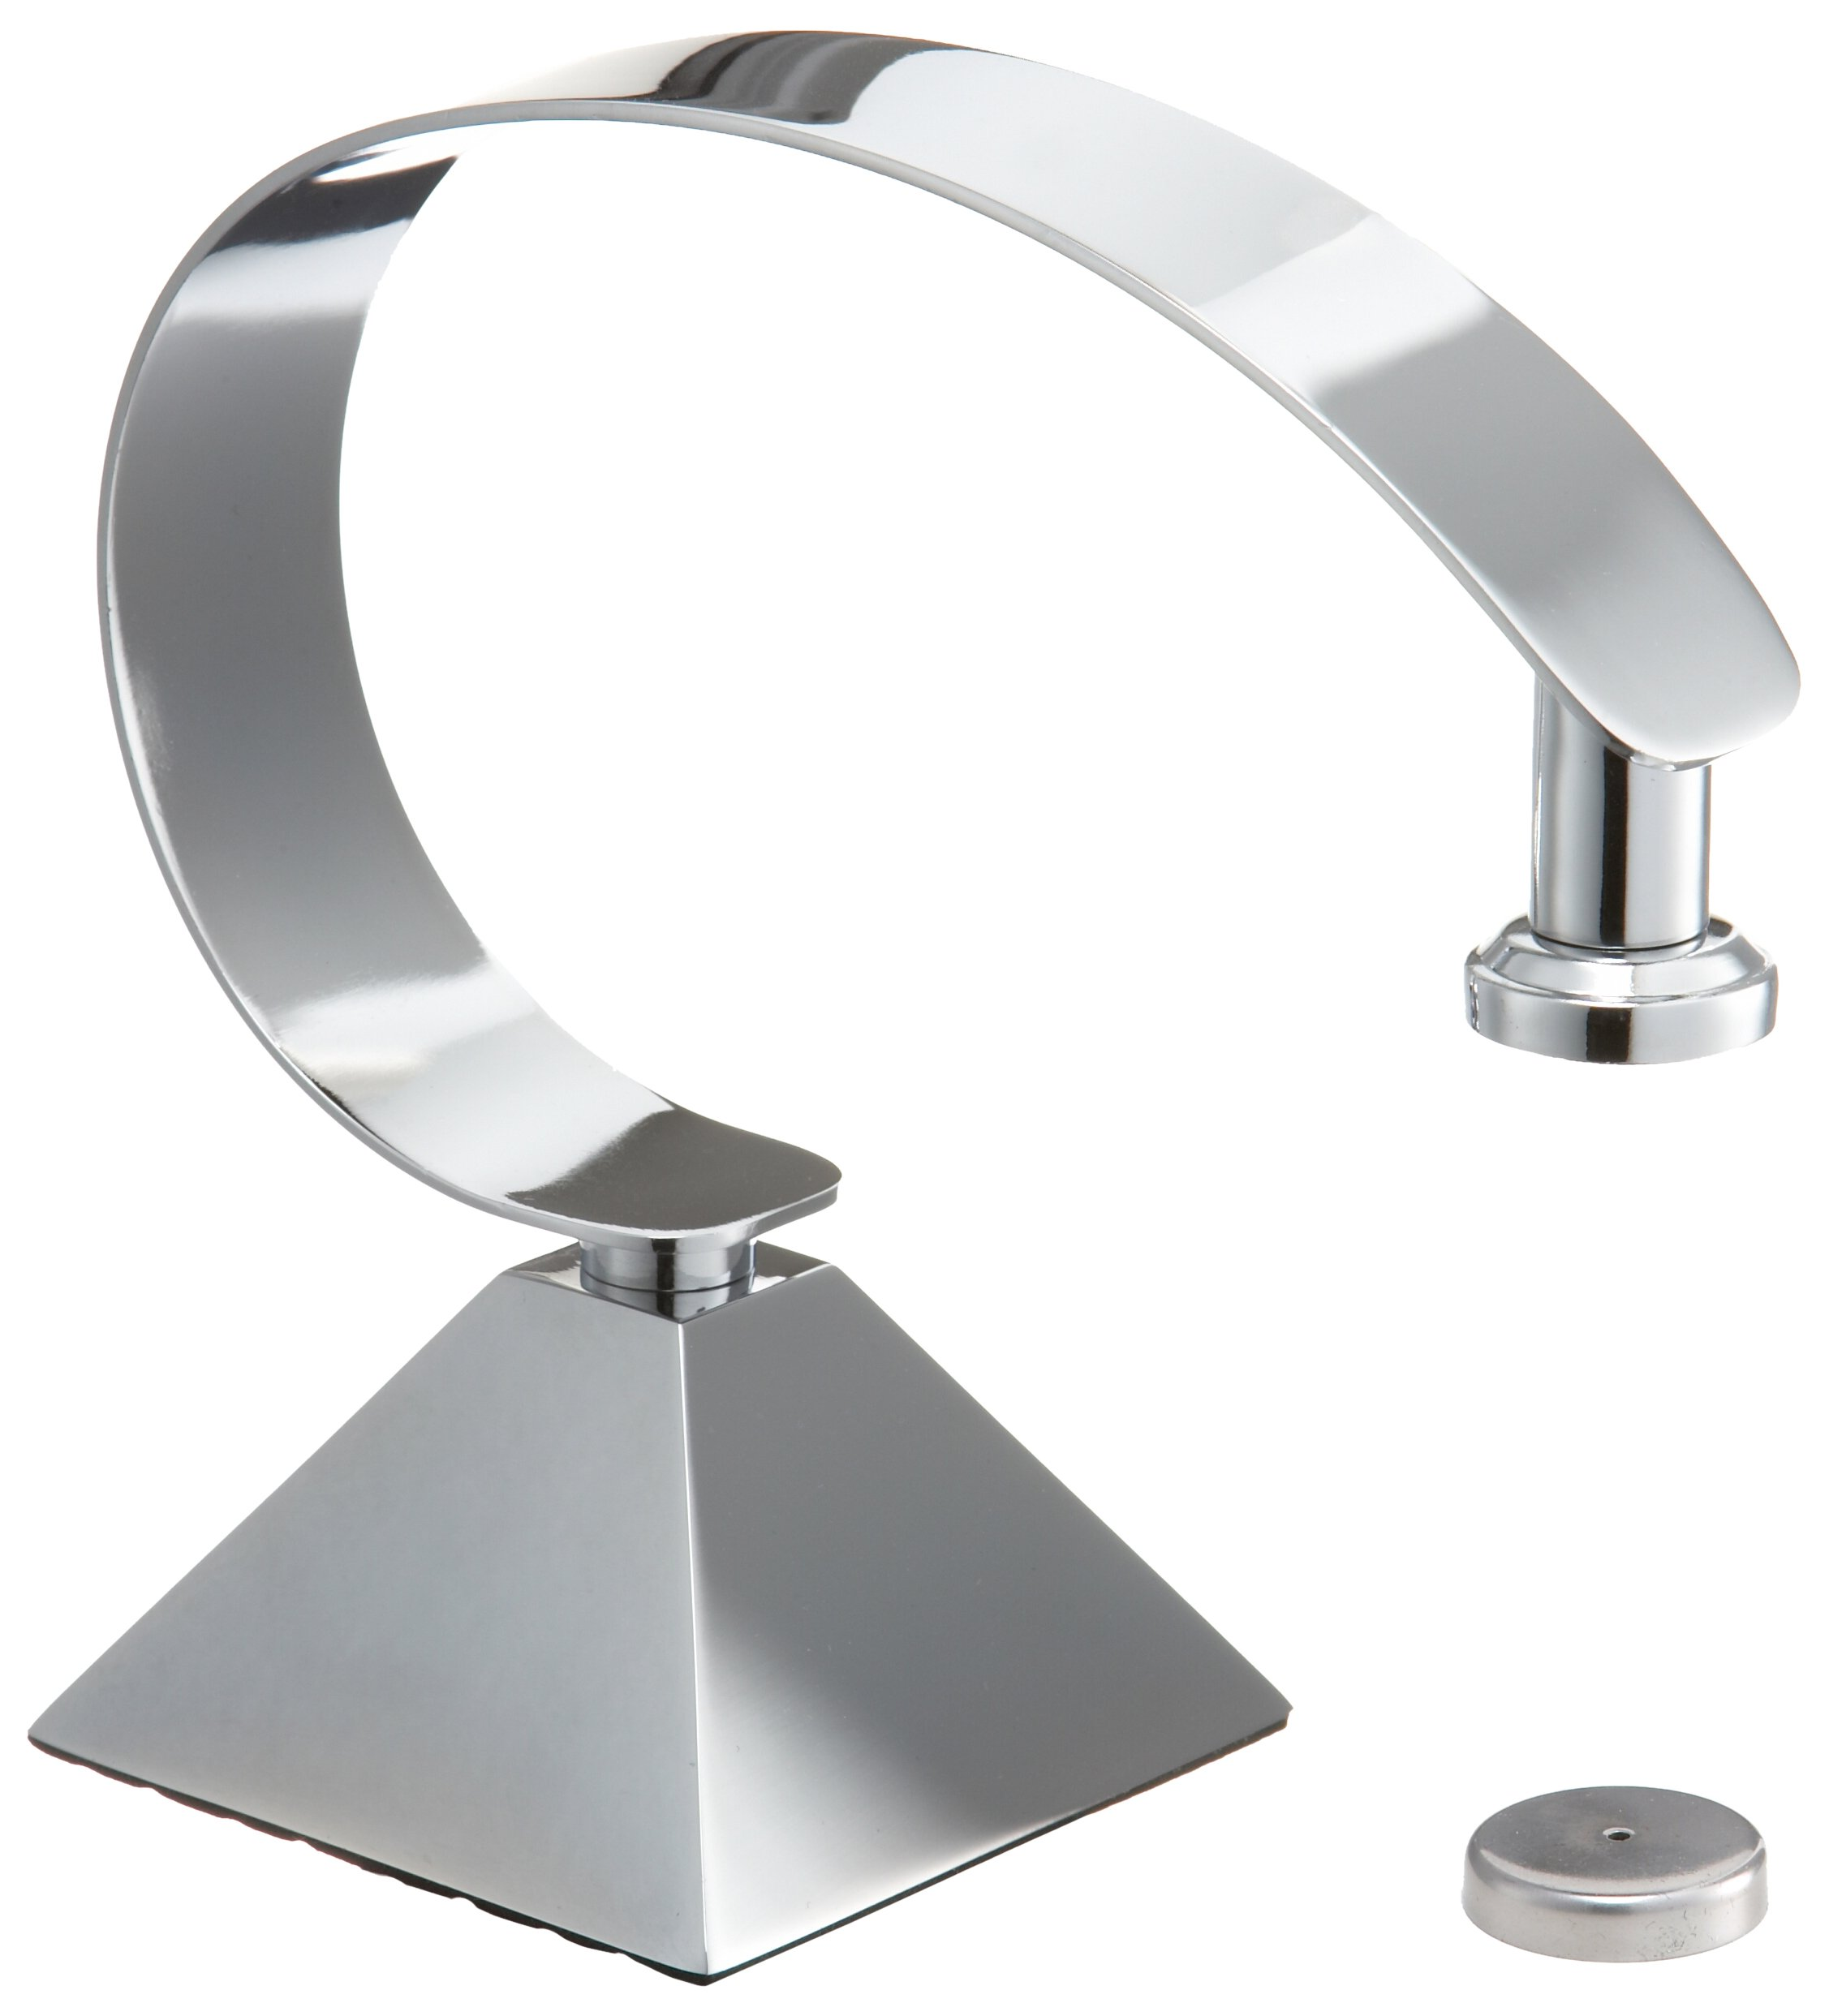 Taymor 02-D2236 Deluxe Countertop Magnetic Soap Holder,Chrome